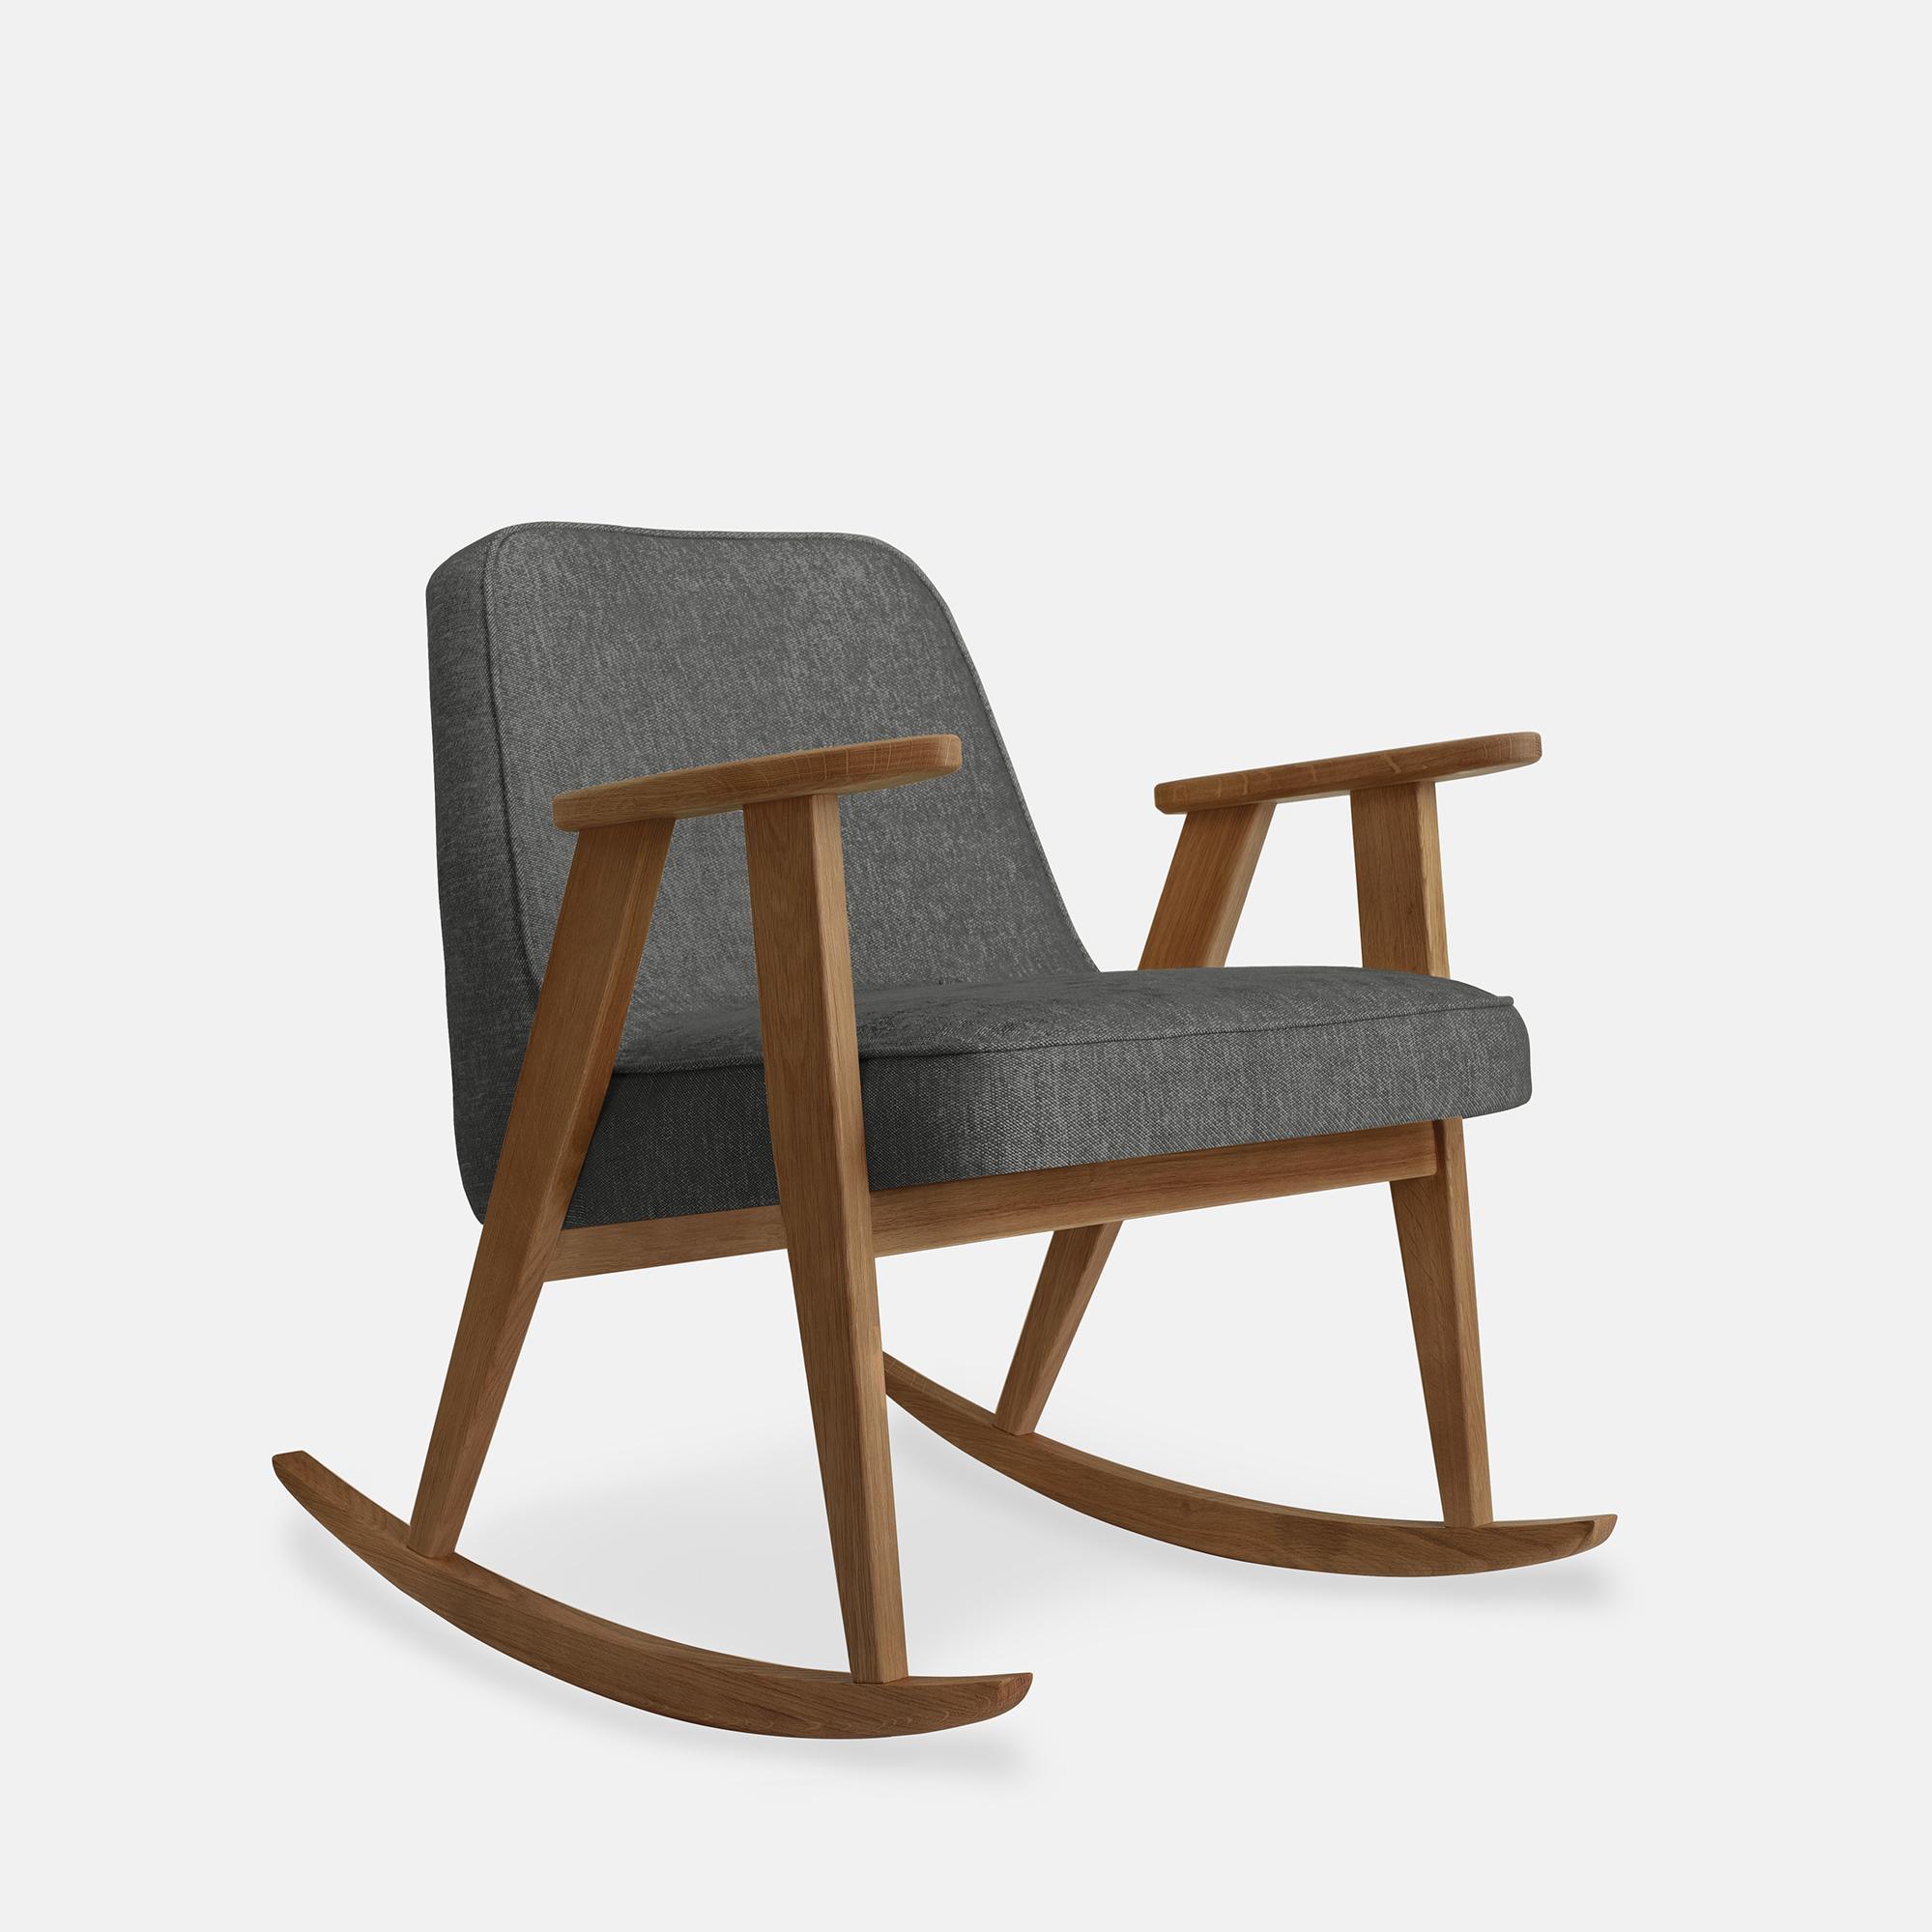 366-Concept-366-Rocking-Chair-W03-Loft-Grey